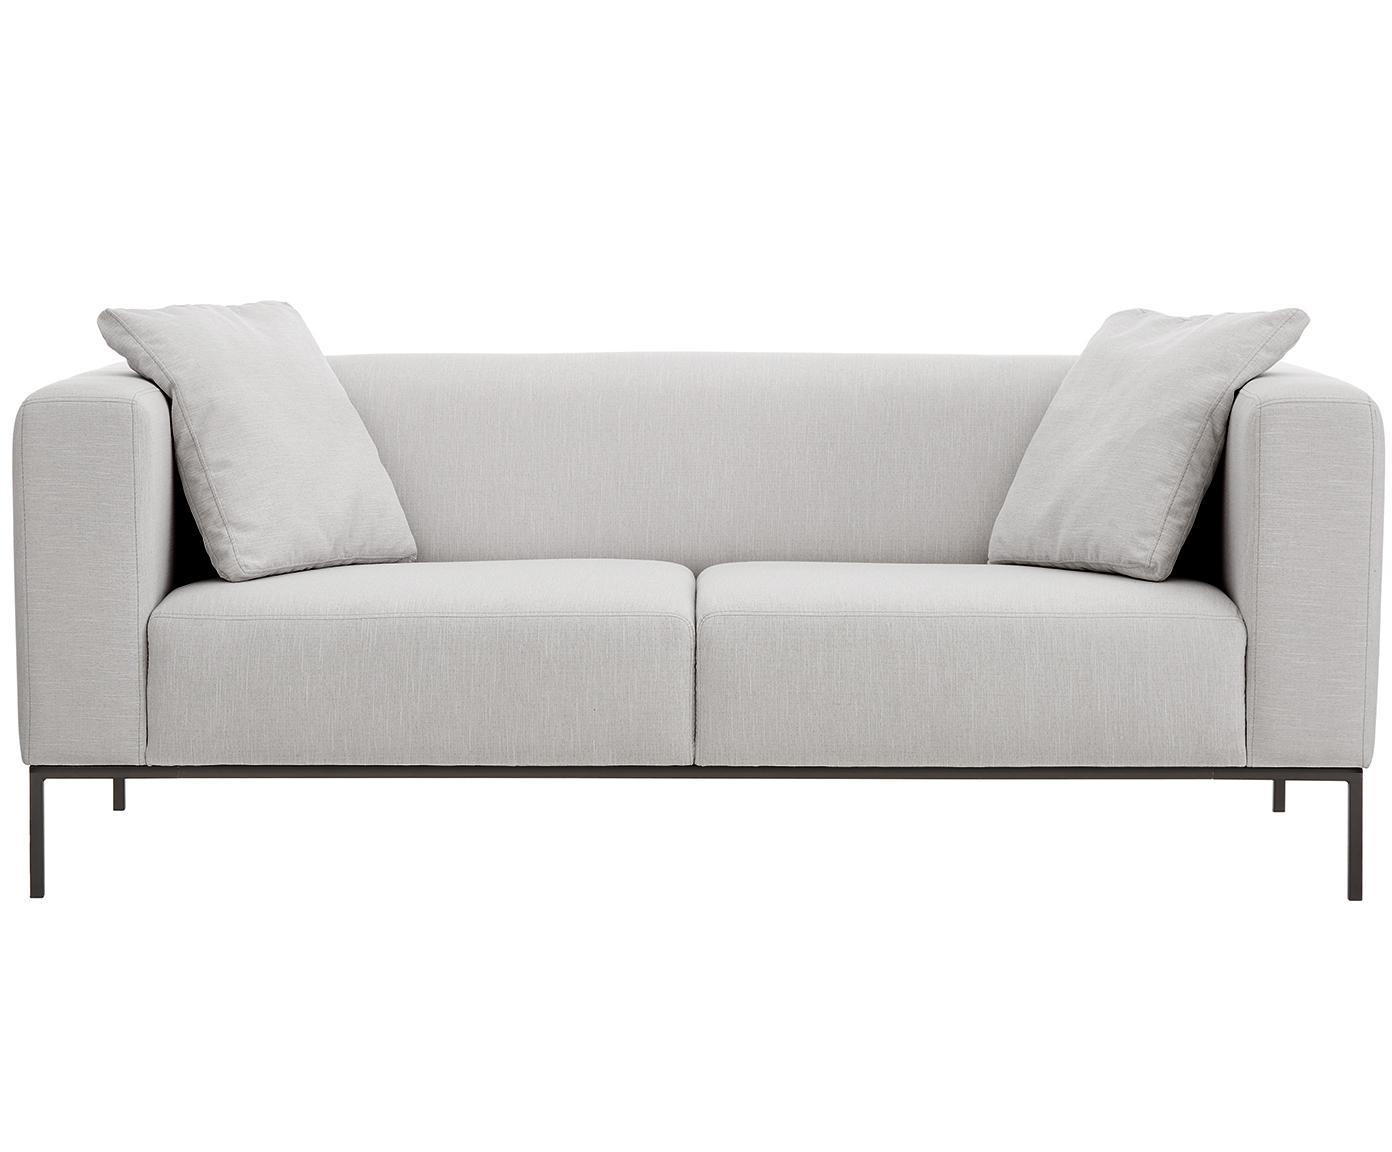 Bank Carrie (3-zits), Bekleding: polyester, Frame: spaanplaat, hardboard, mu, Poten: gelakt metaal, Webstoff Grau, B 202 x D 86 cm